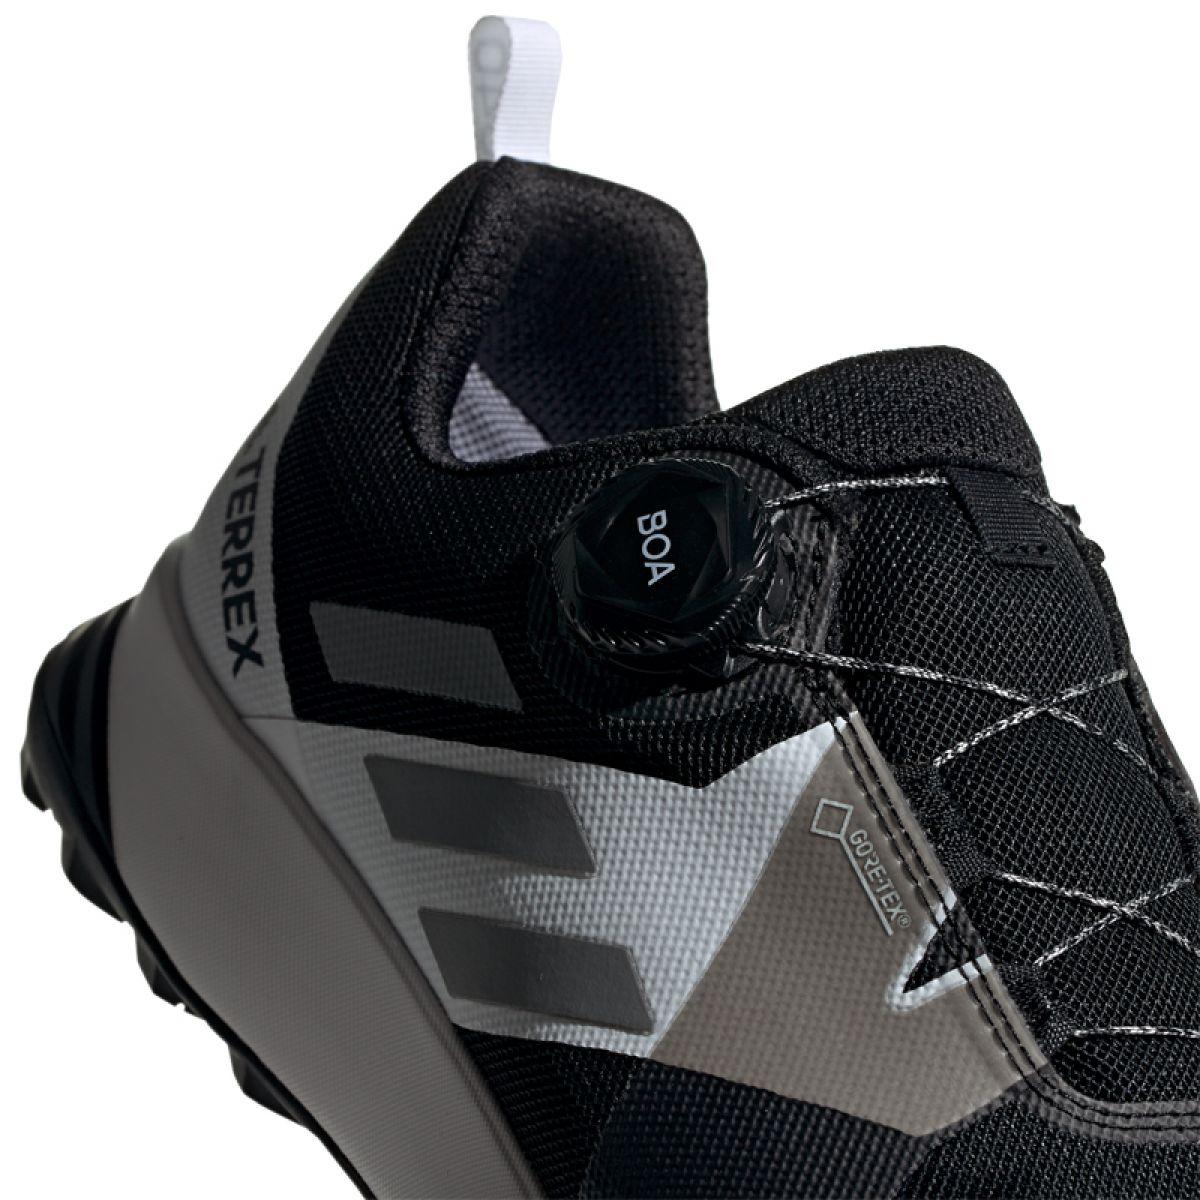 femenino Planta de semillero Oír de  Adidas Terrex Two Boa Gtx M F97634 shoes black grey - ButyModne.pl